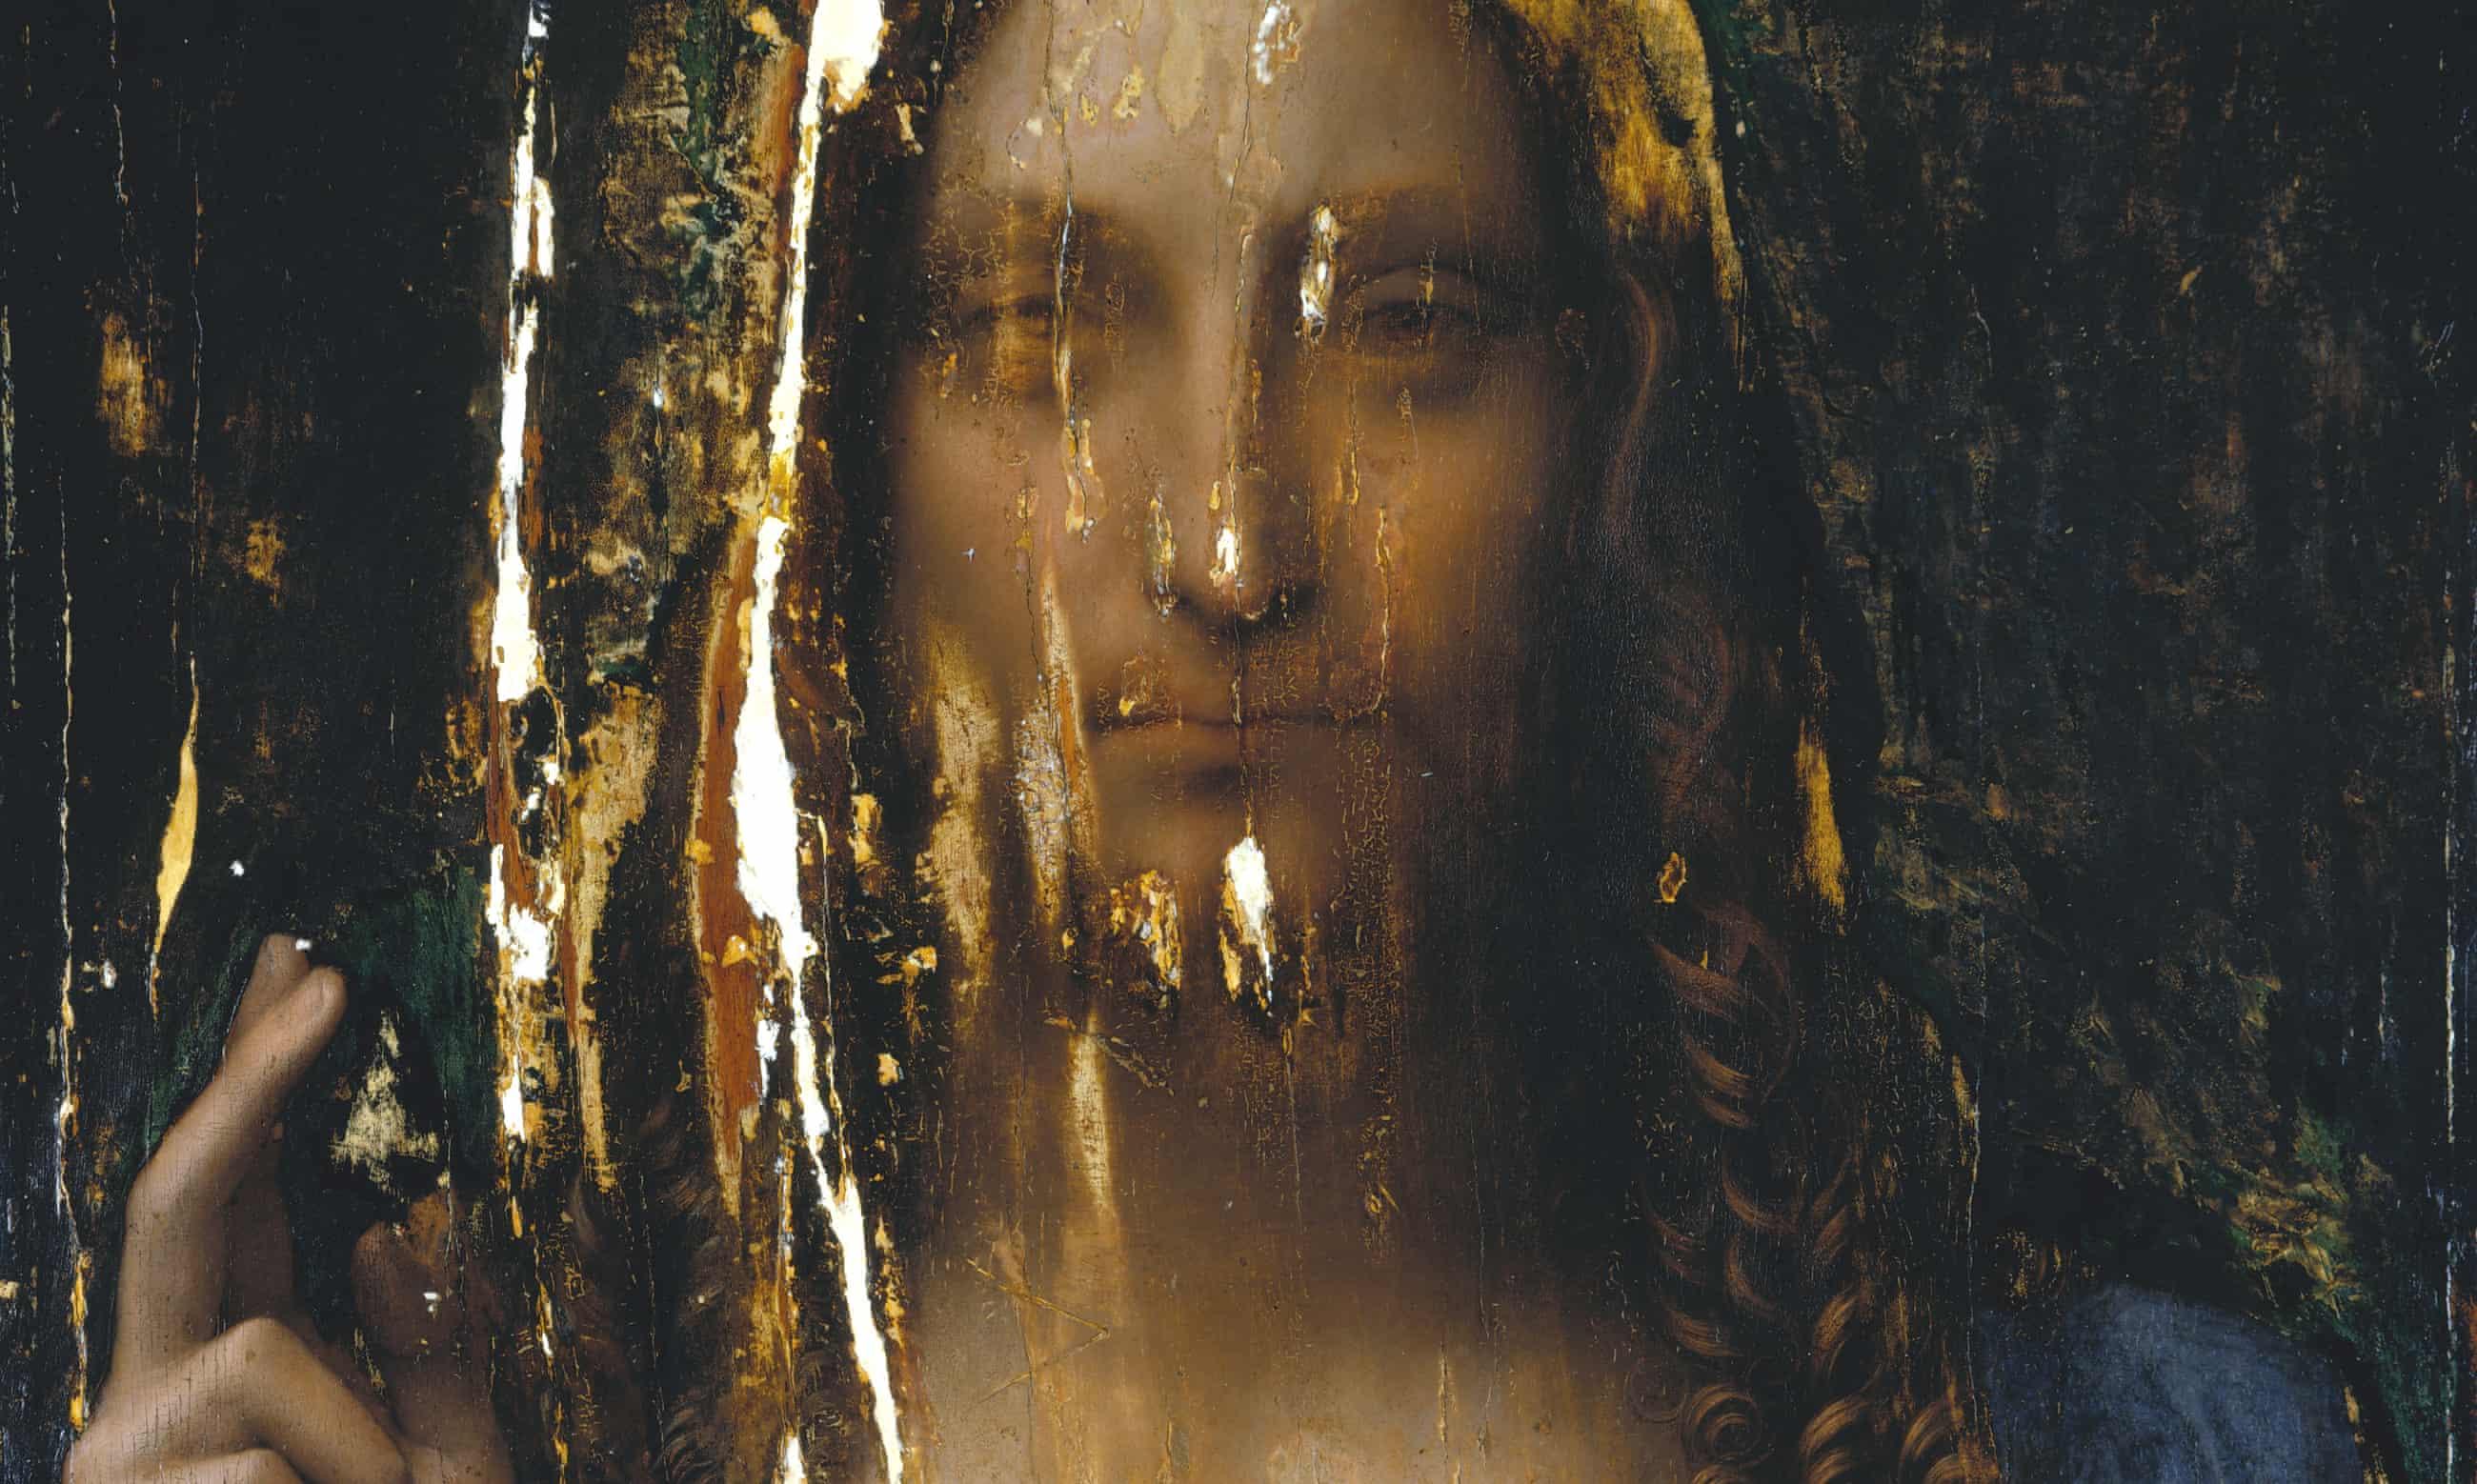 Salvator Mundi Photograph- Courtesy Dianne Modestini : © 2011 Salvator Mundi LLC  BÍ ẨN CỦA DA VINCI: BỨC TRANH ĐẮT NHẤT THẾ GIỚI SALVATOR MUNDI Salvator Mundi Photograph Courtesy Dianne Modestini    2011 Salvator Mundi LLC